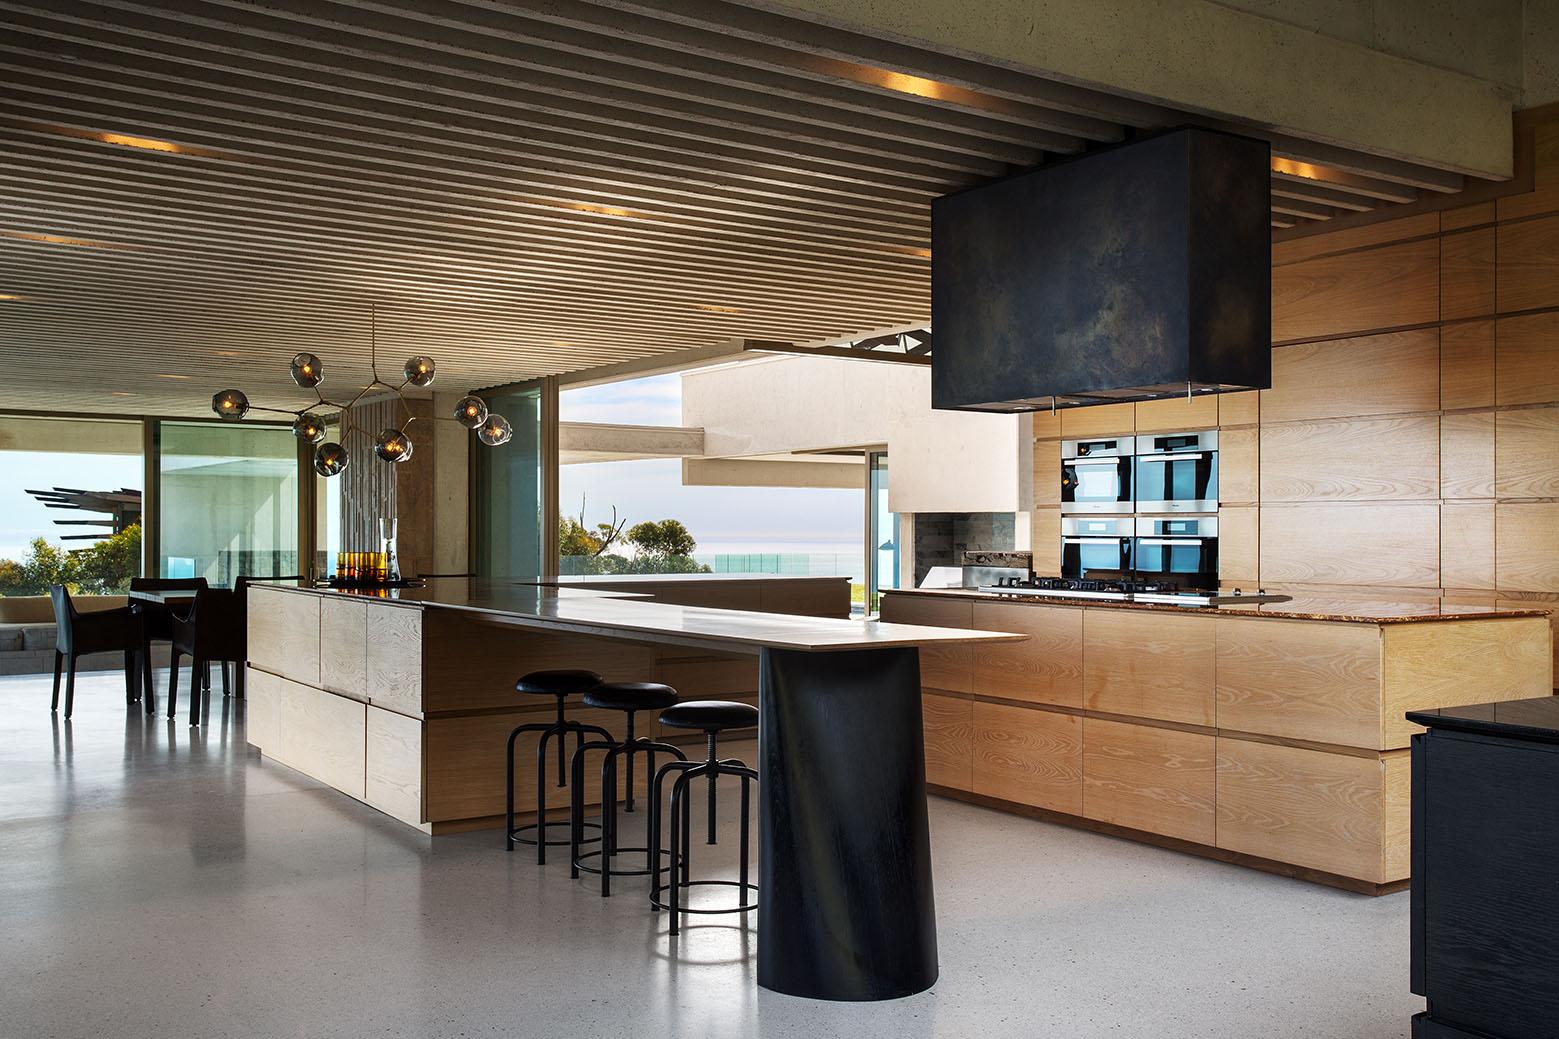 Contemporary ridgetop house with ocean and mountain views